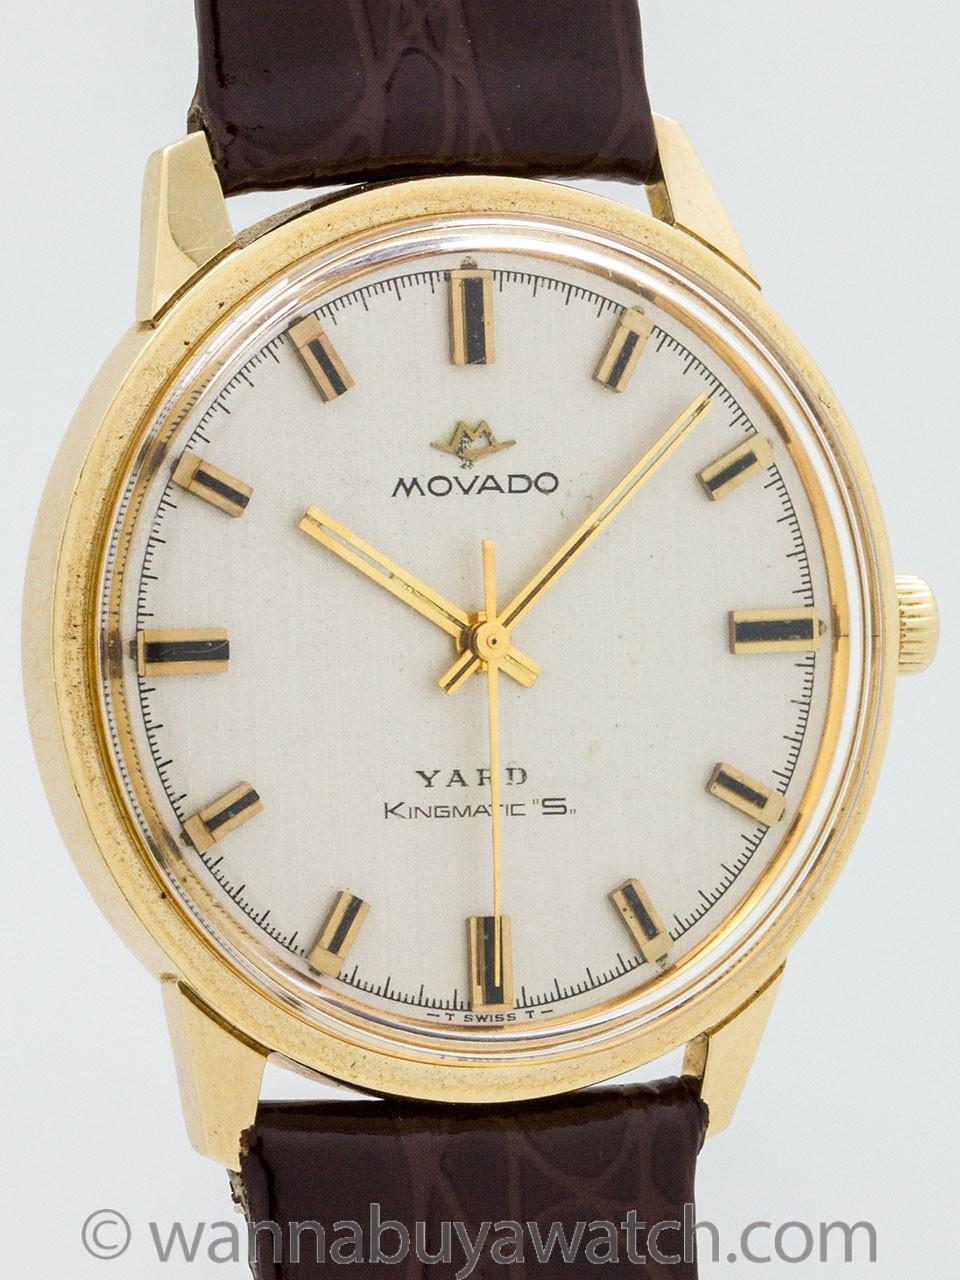 Movado 14K YG Kingmatic circa 1960s